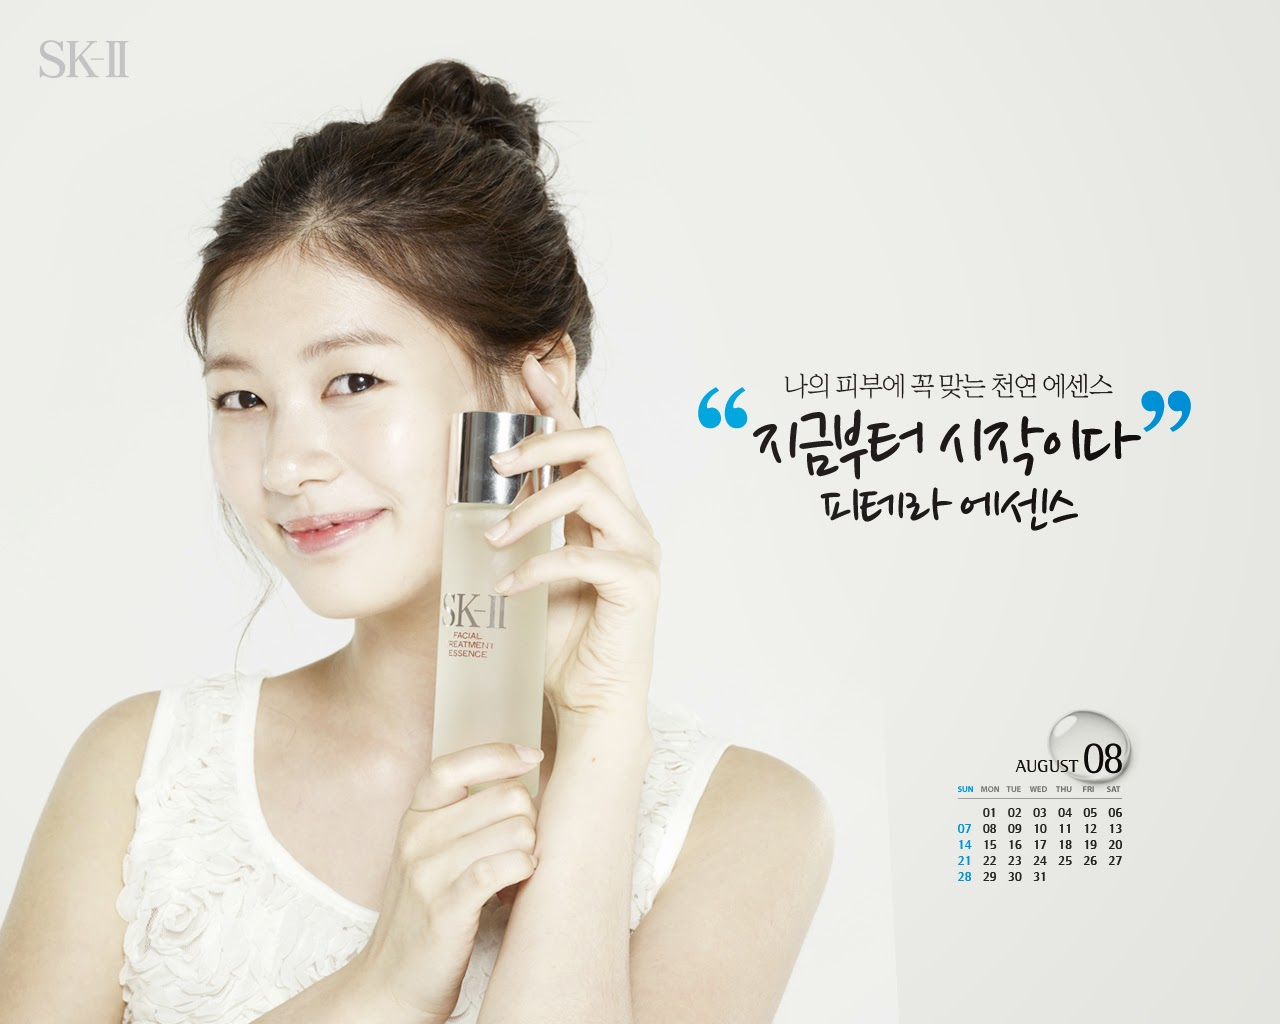 Yoon Eun Hye Boyfriend In Real Life Cute Korean Actress Ju...